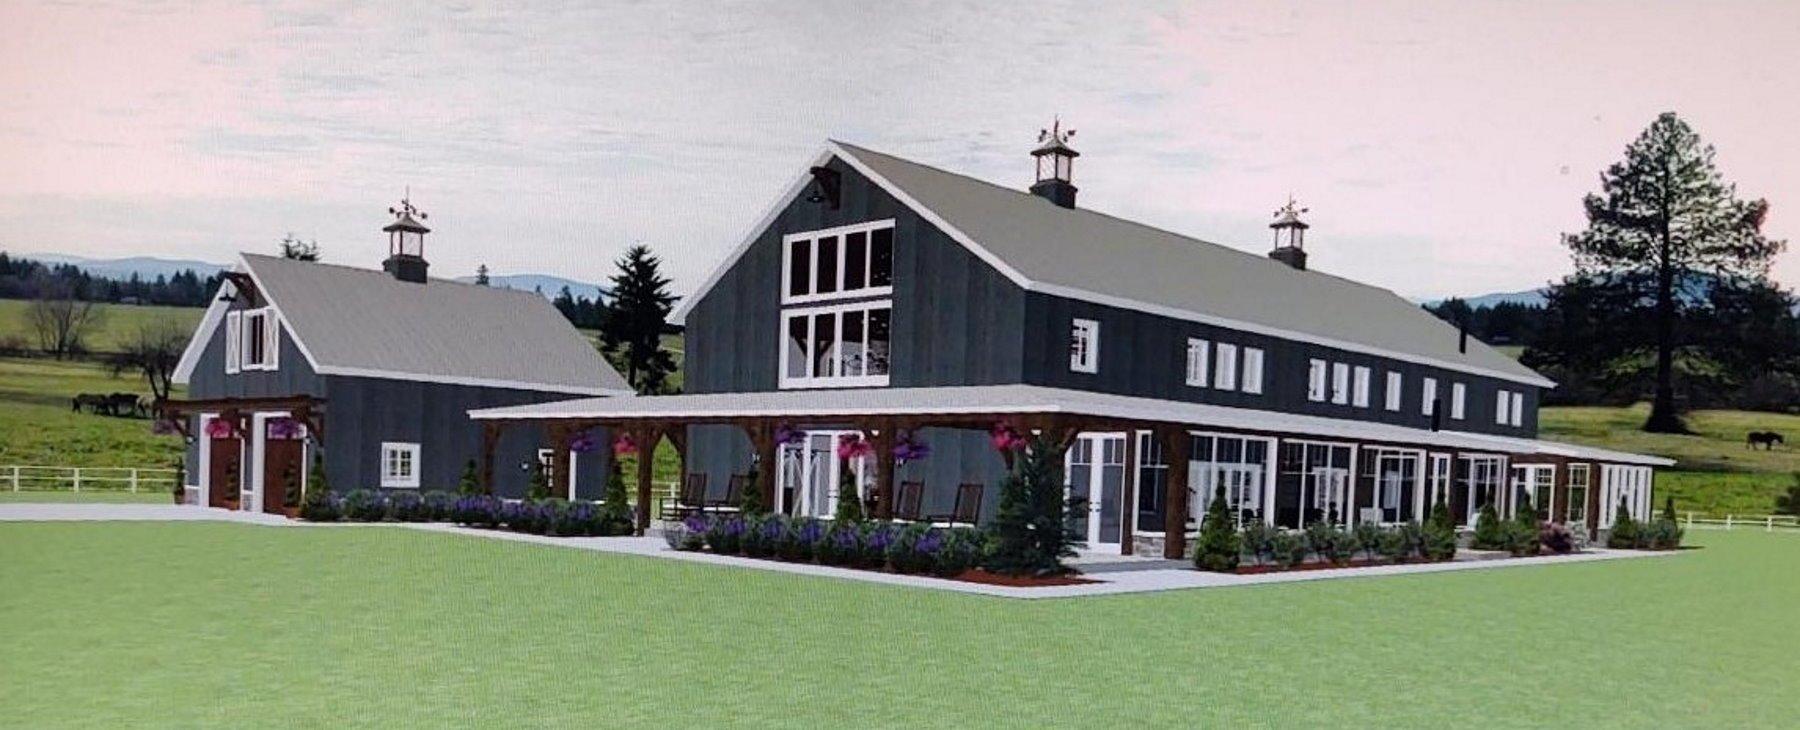 Barndominium design with wrap-around porch and garage.